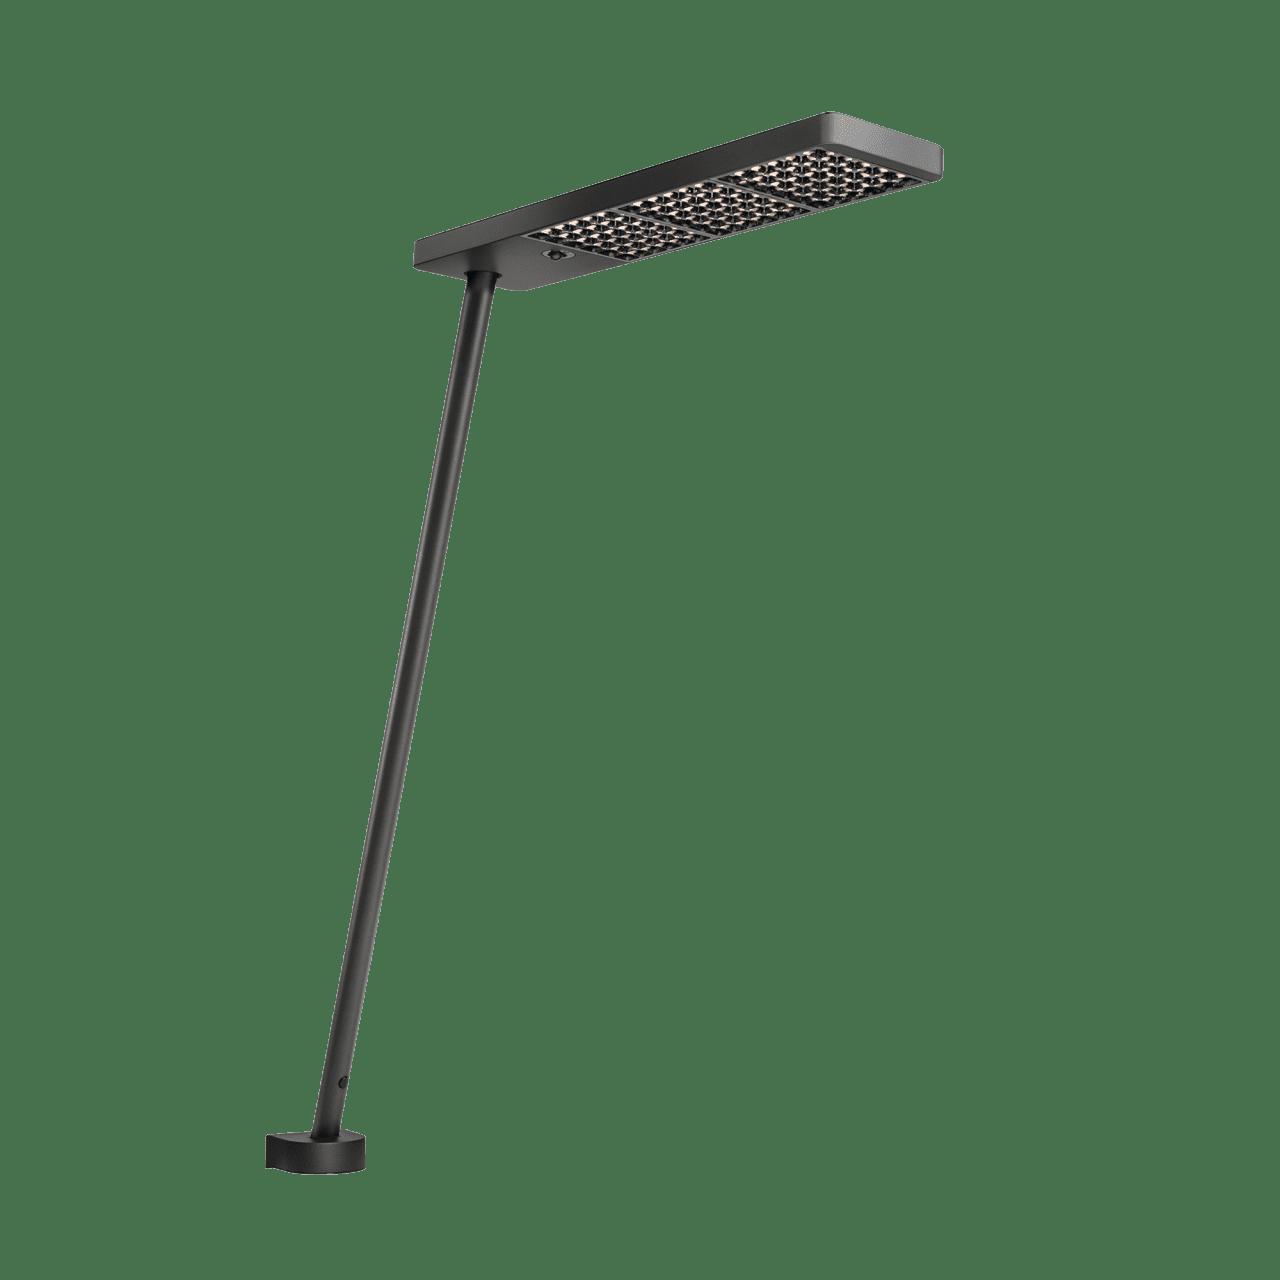 XT-A Single Clamp Tischleuchte